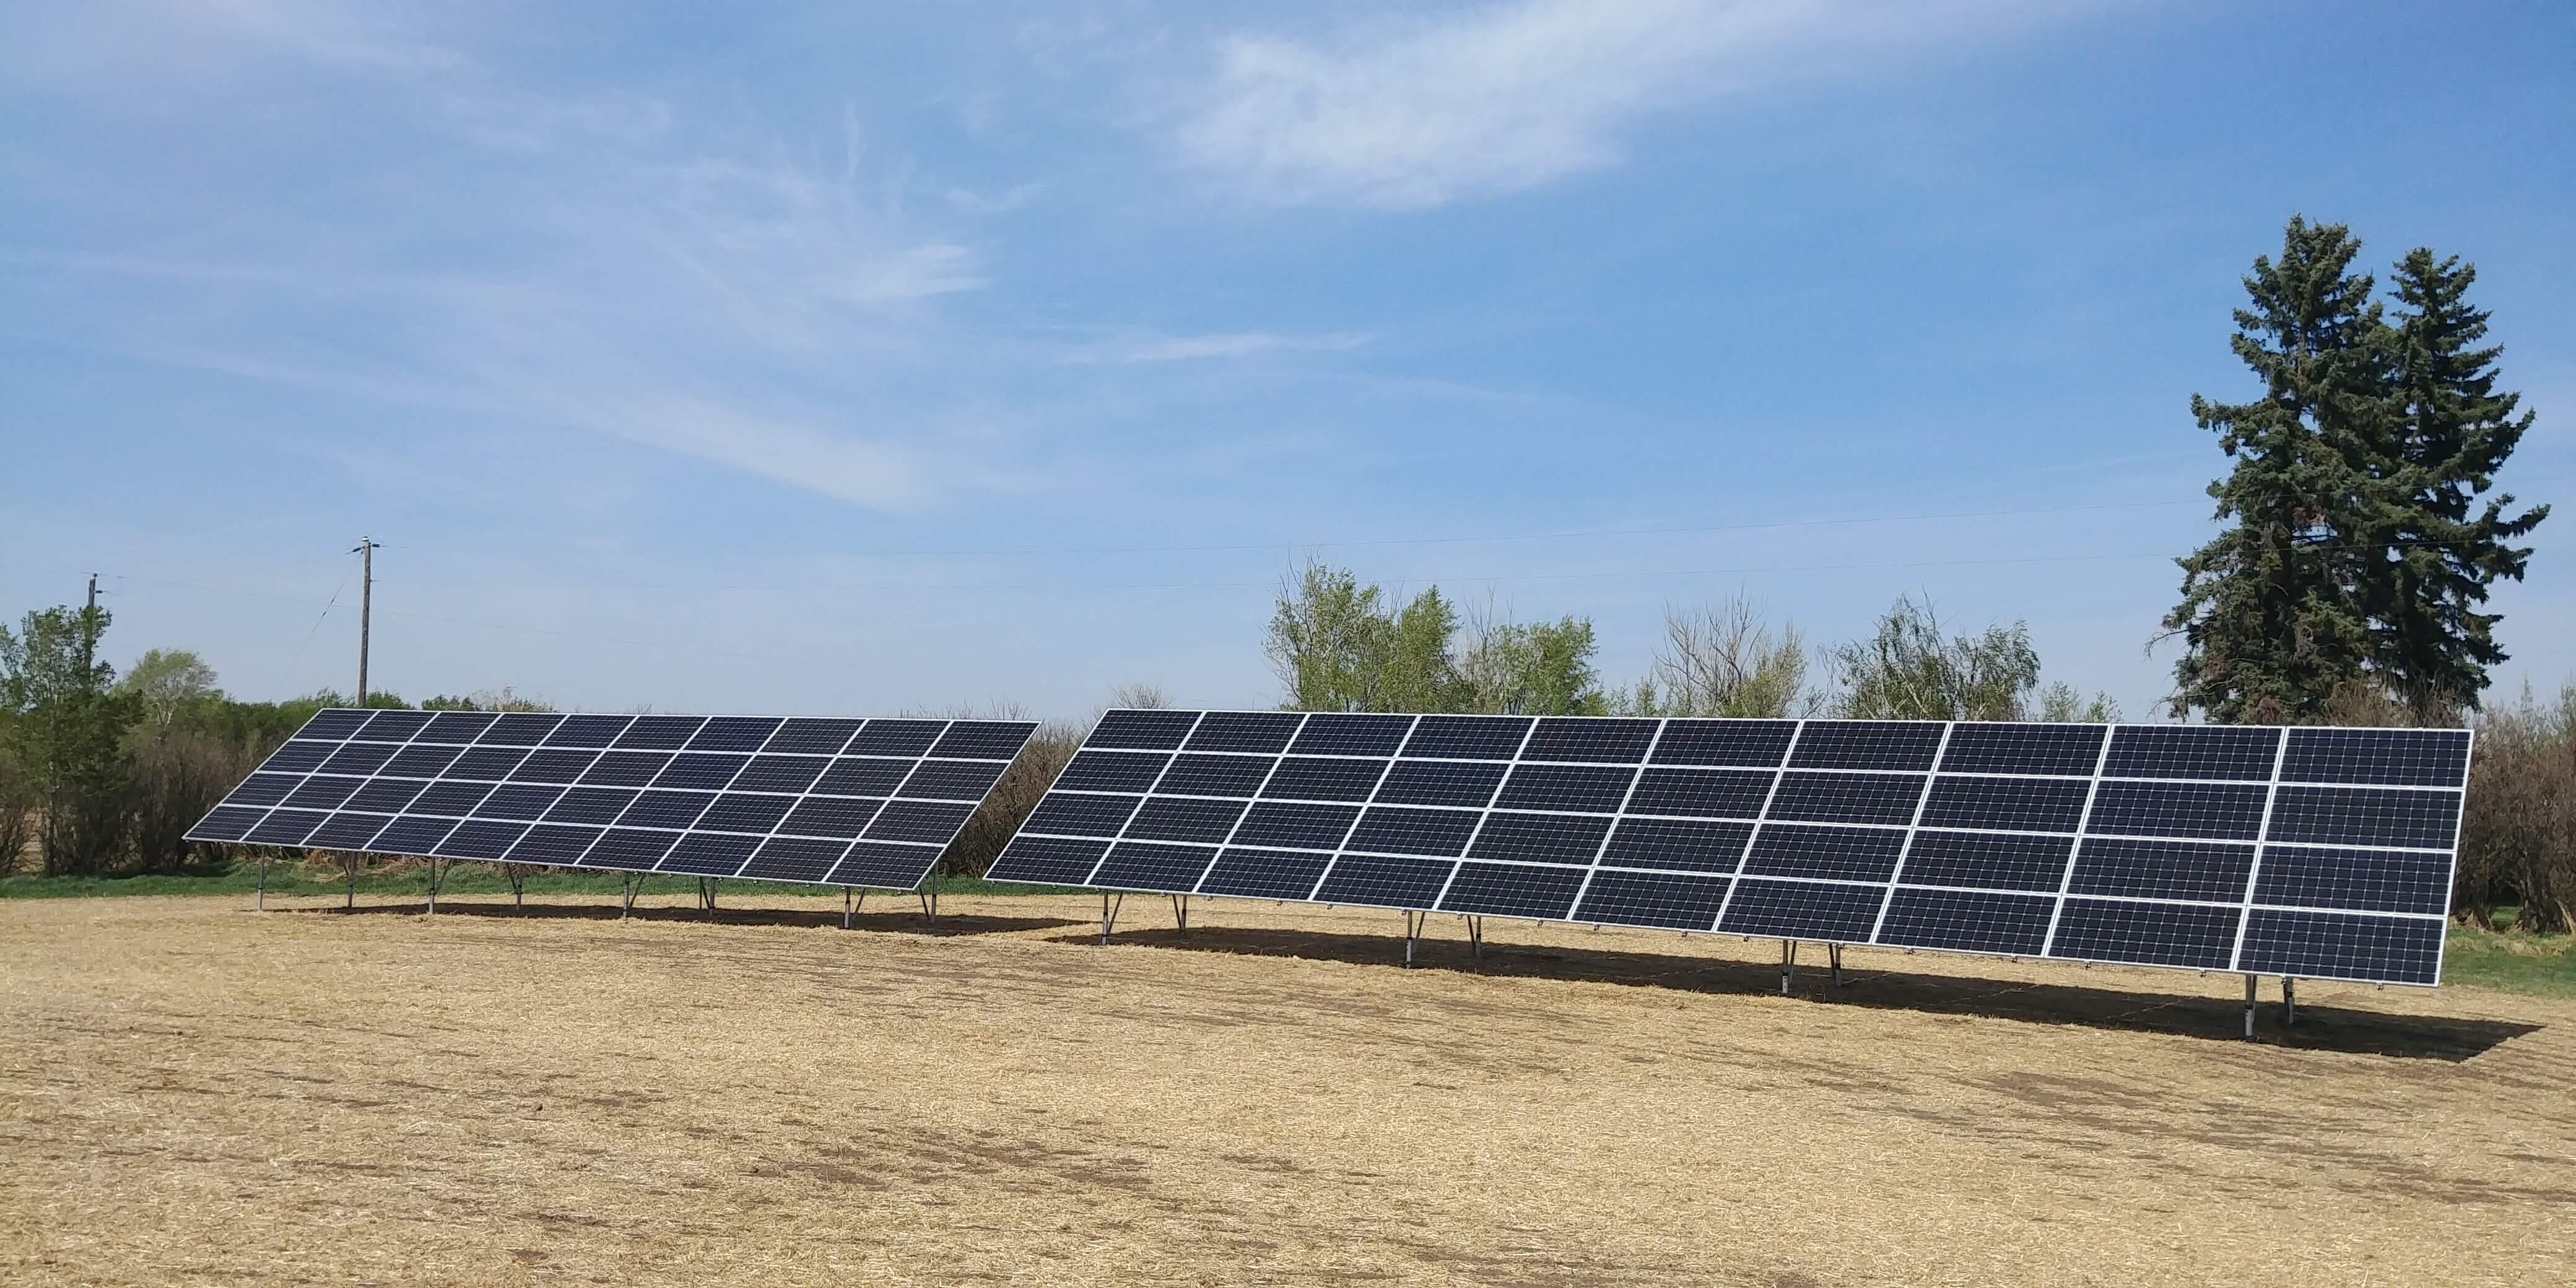 25.6 kw solar array Flagstaff county Killiam Alberta